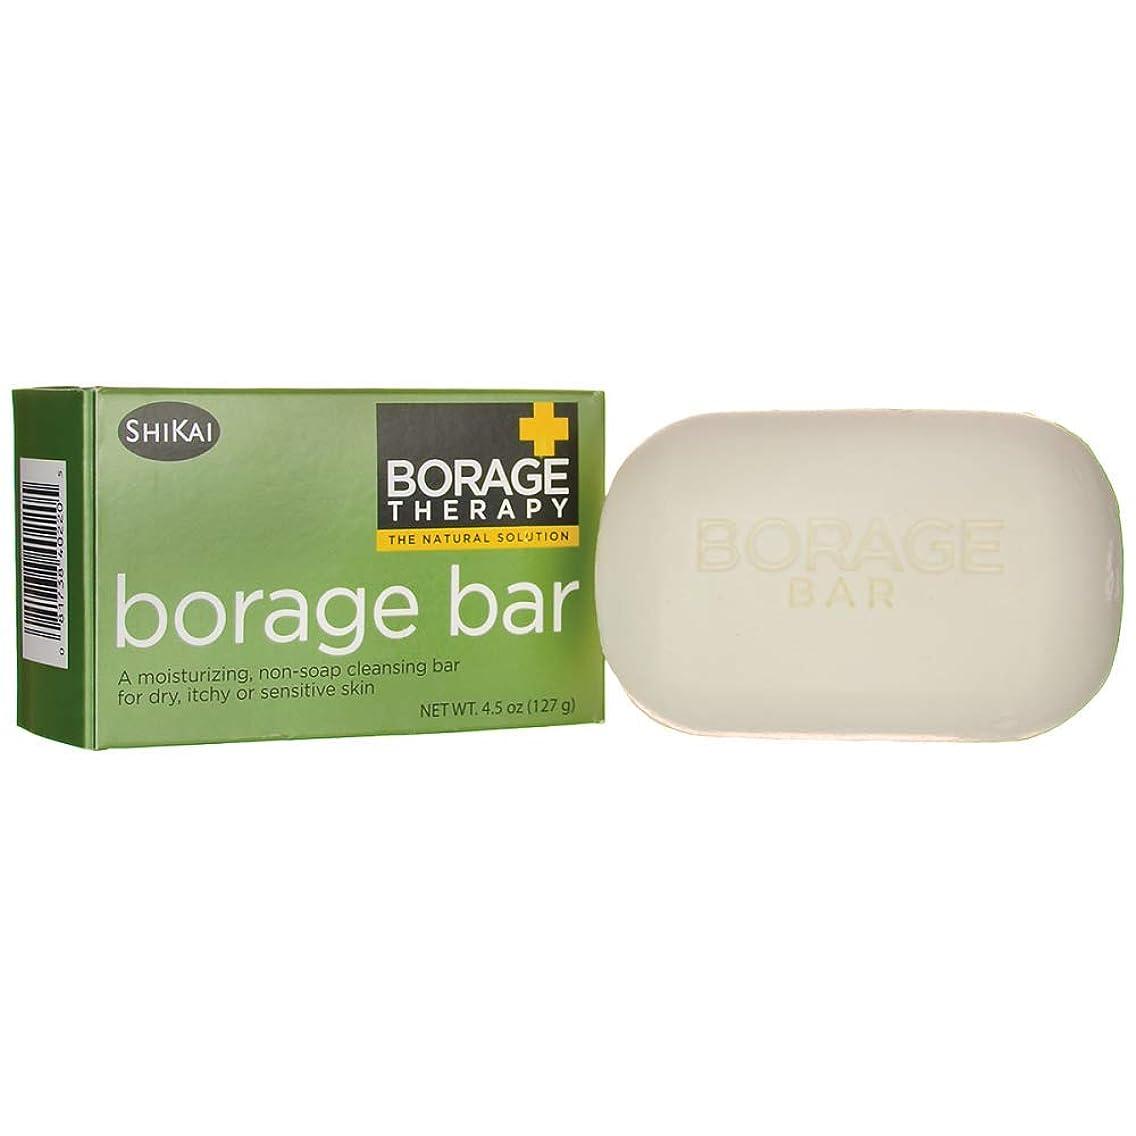 Shikai, Soap Borage Bar, 4.5 Ounce